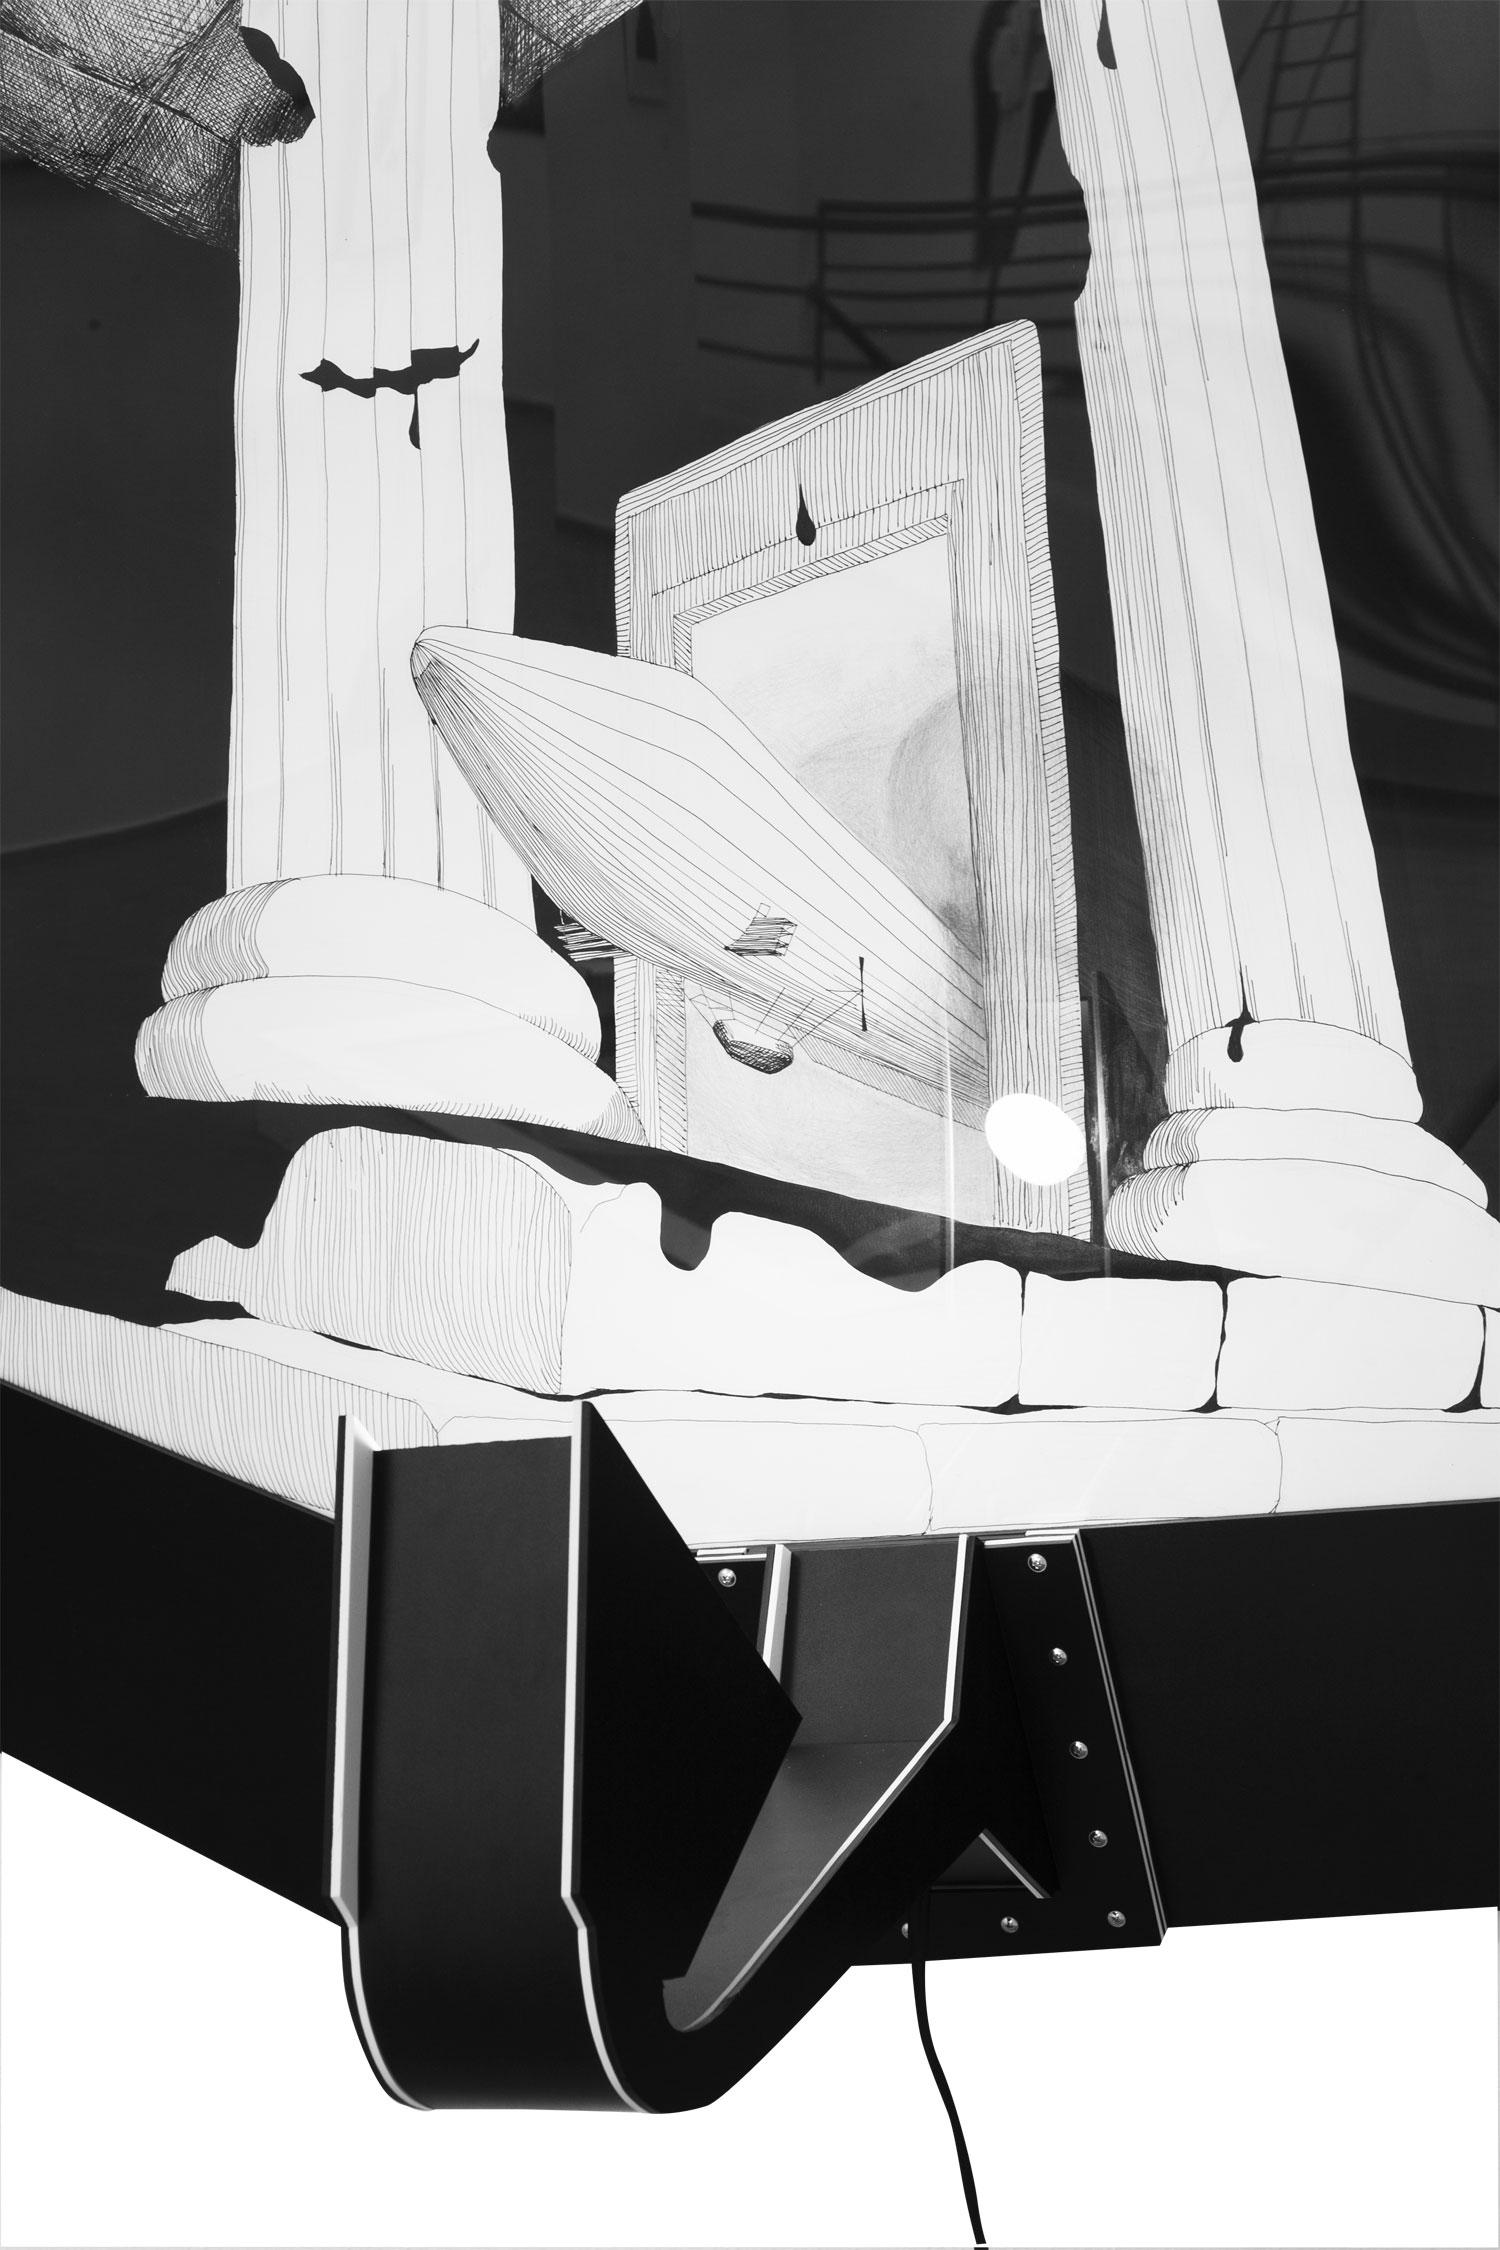 The Biggest Gift - detail, frame design Sylvia Jokelová